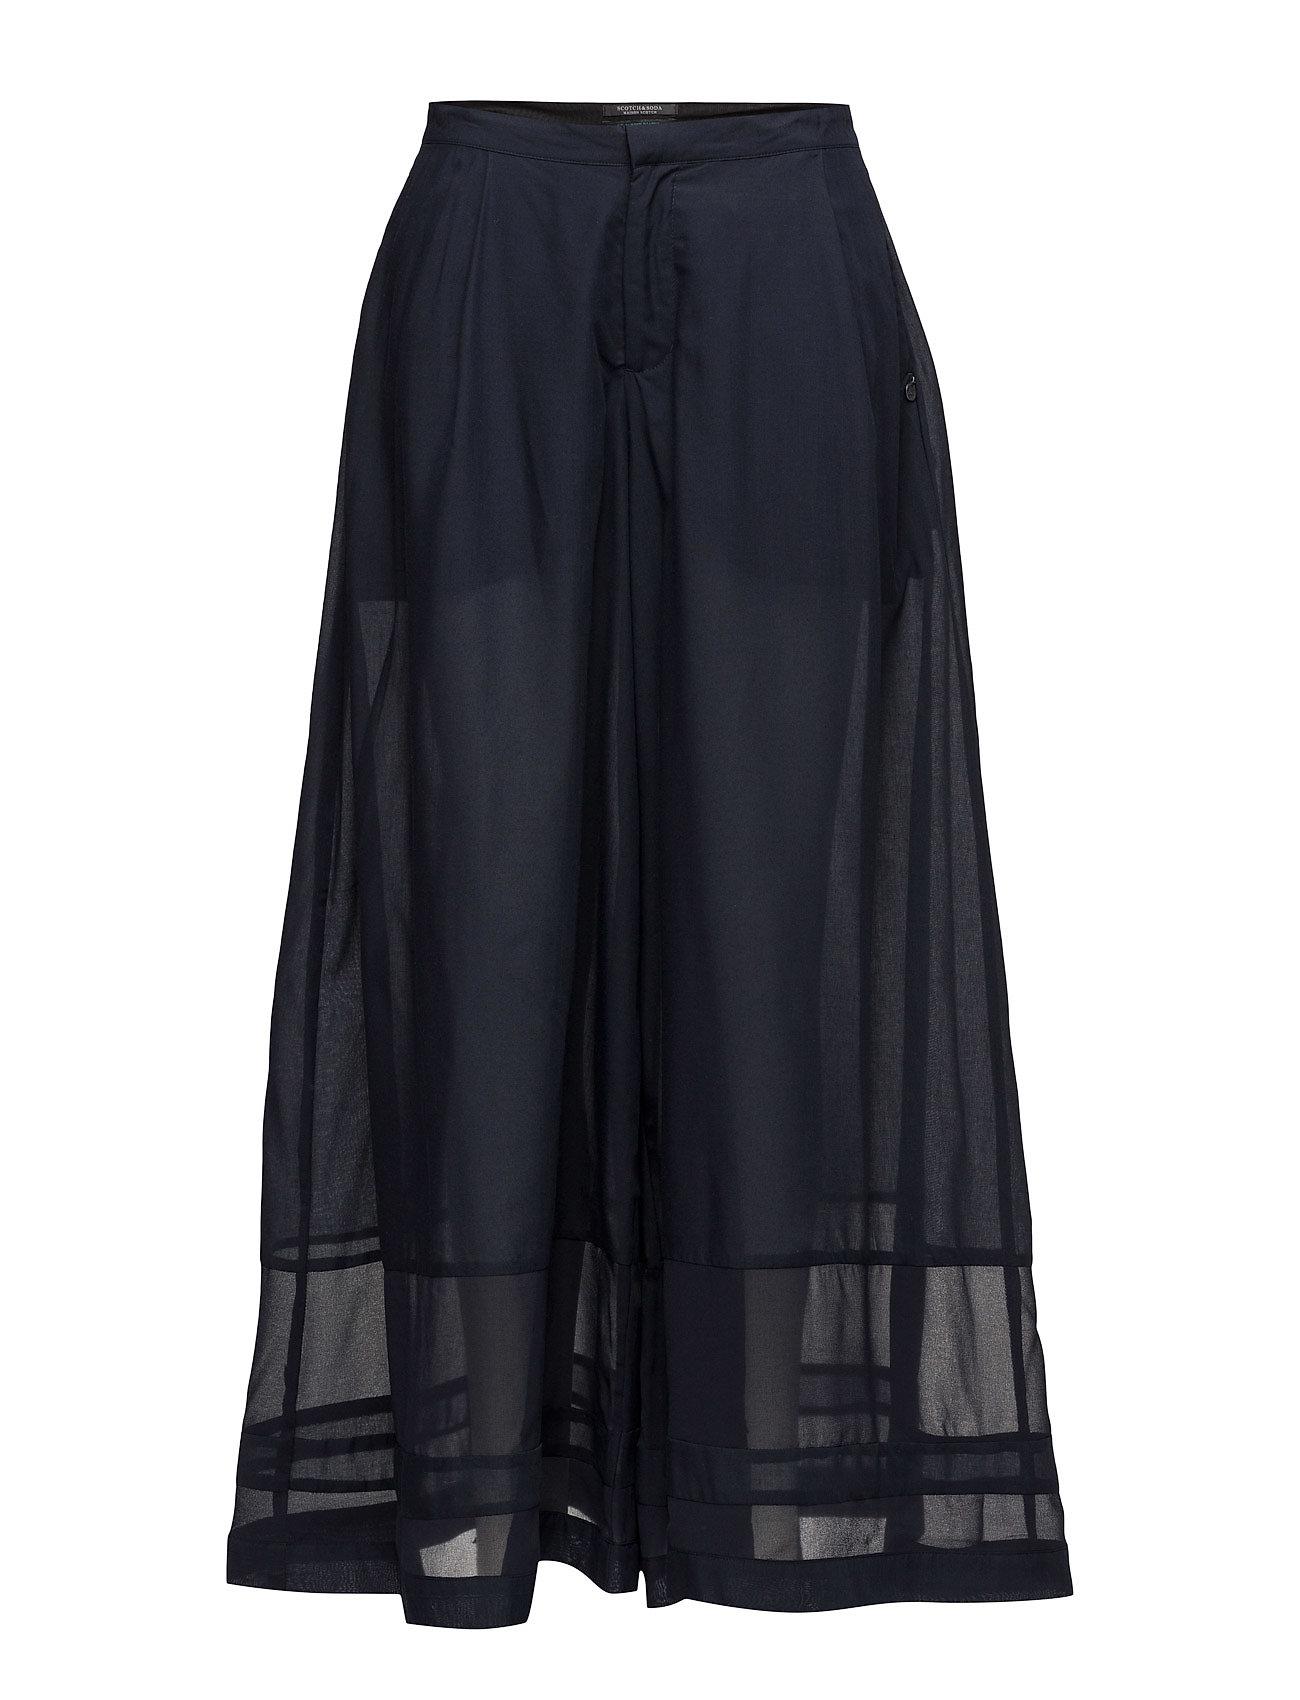 Wide Leg Pant With Contrast Hem Panels Scotch & Soda Trompetbukser til Damer i